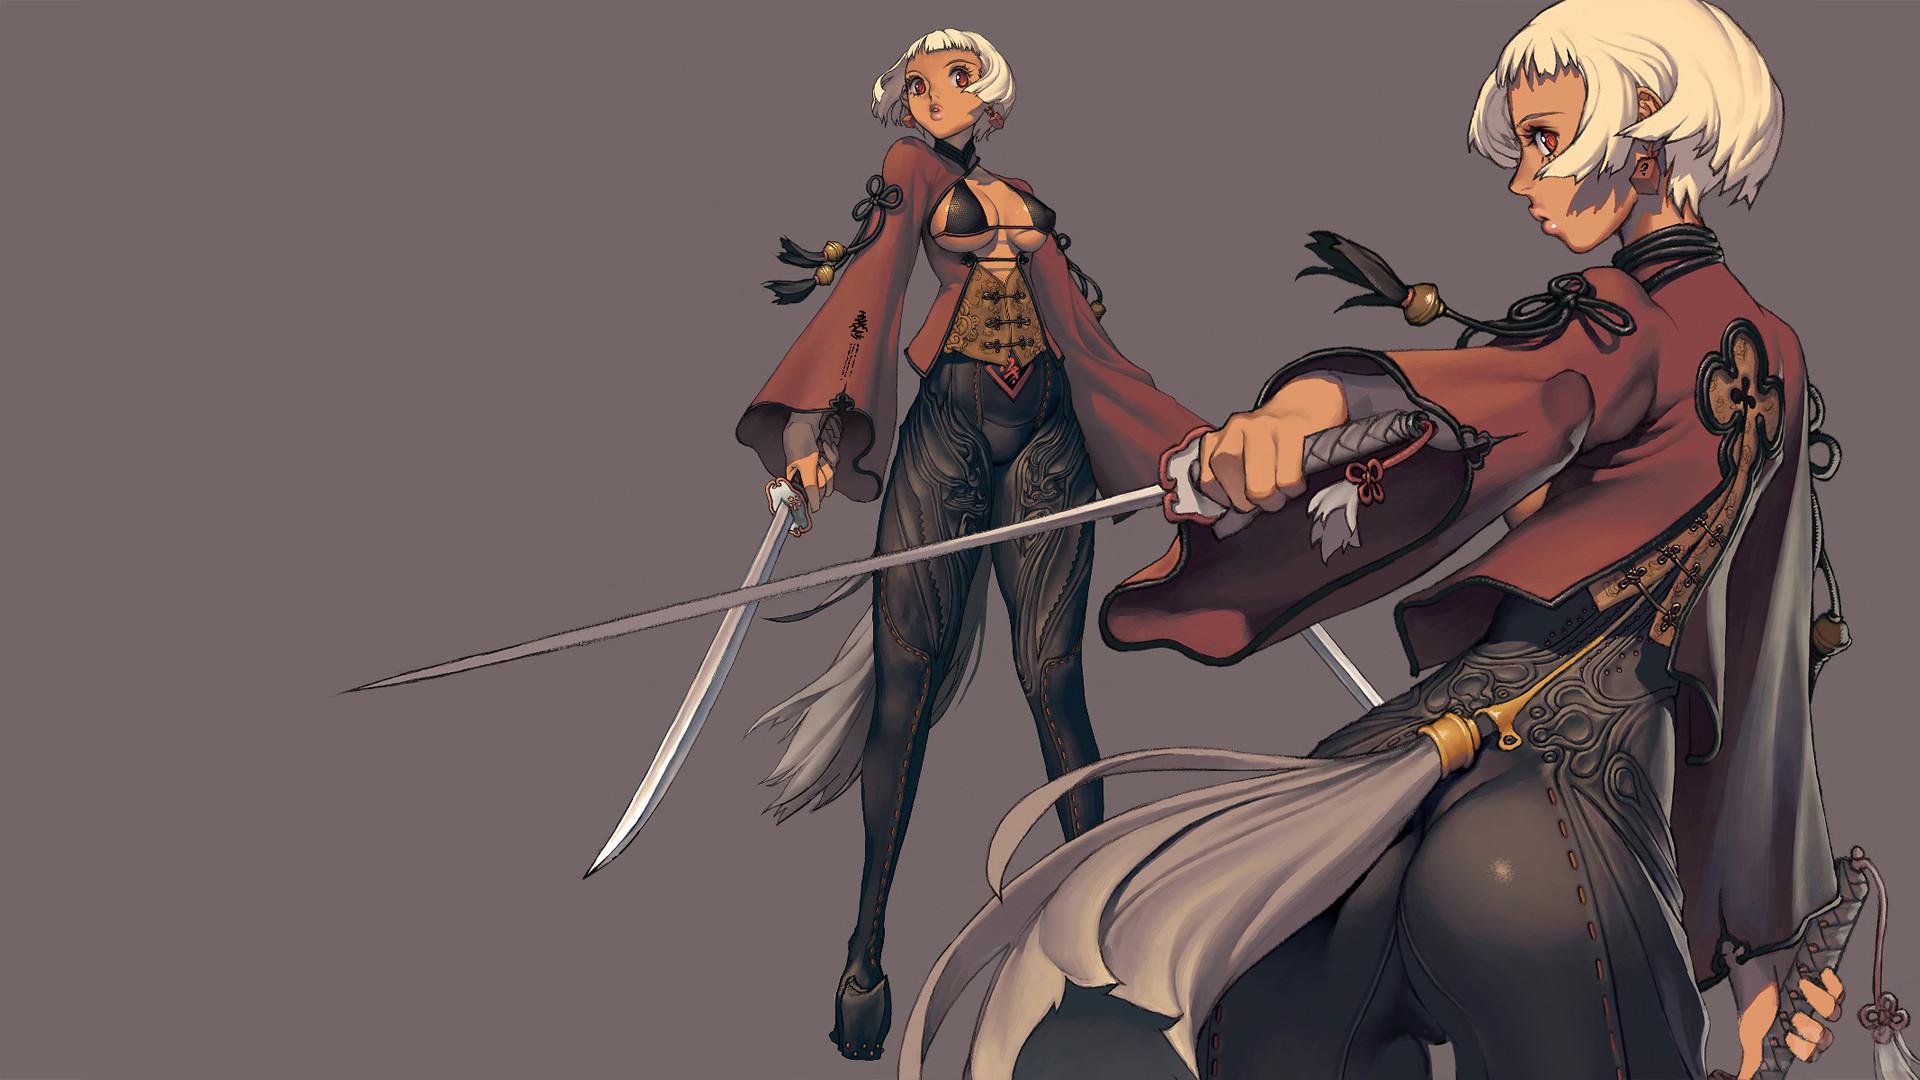 video games hyung-tae kim blade and soul simple background mmorpg game  manga art HD Wallpaper